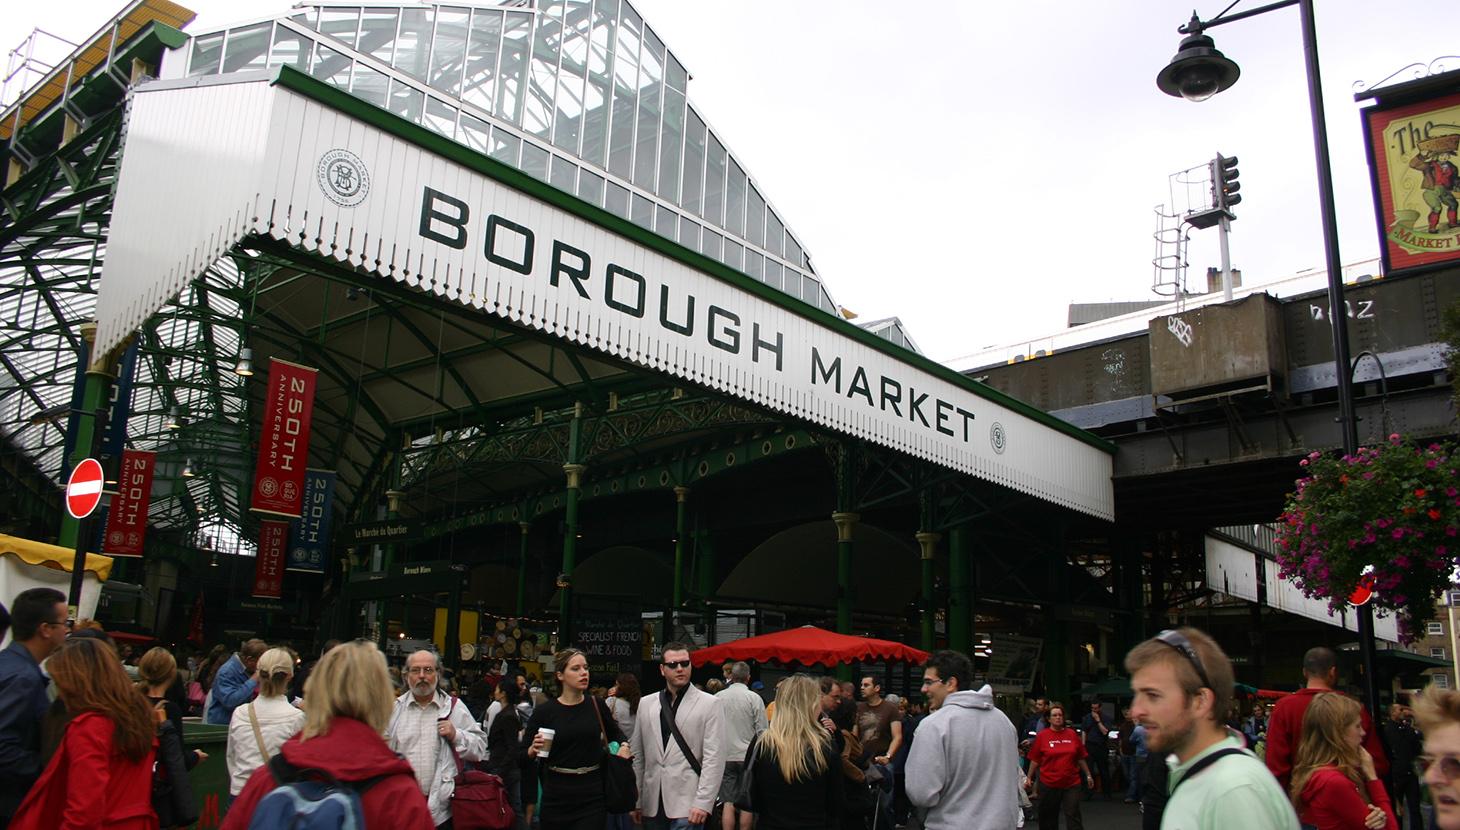 boroughmarket1460